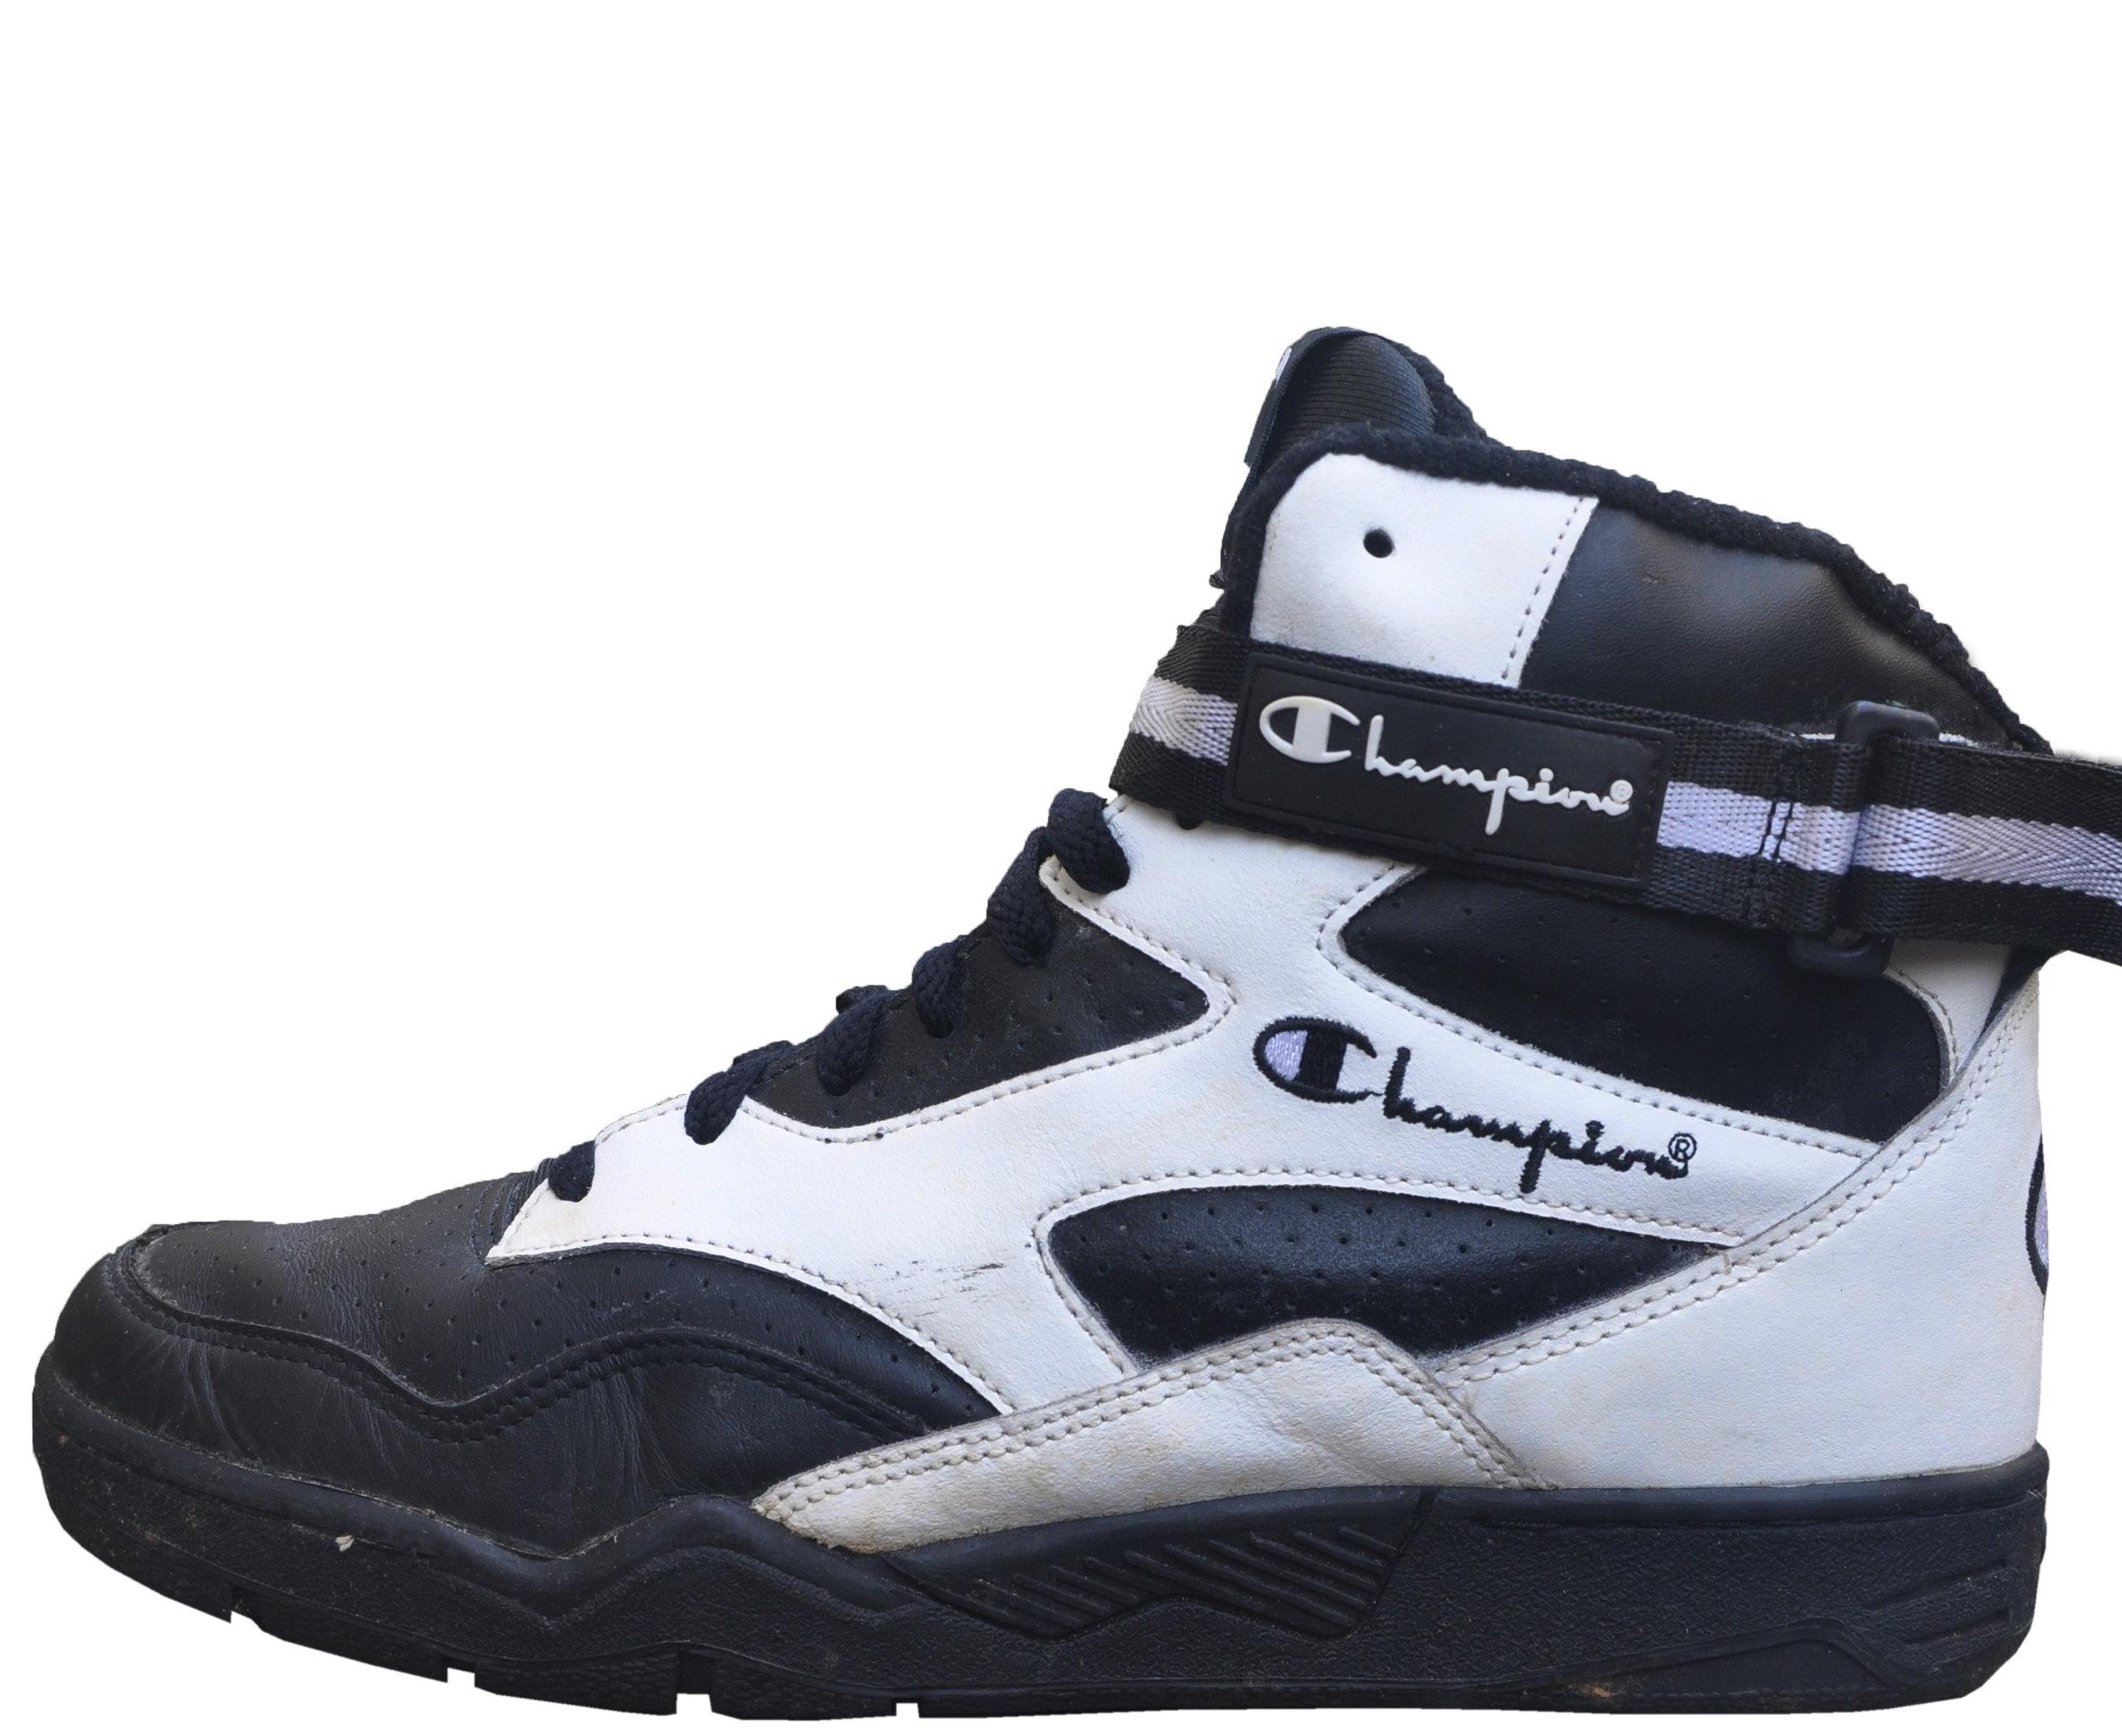 7466de6b952b63 champion high top sneakers Sale